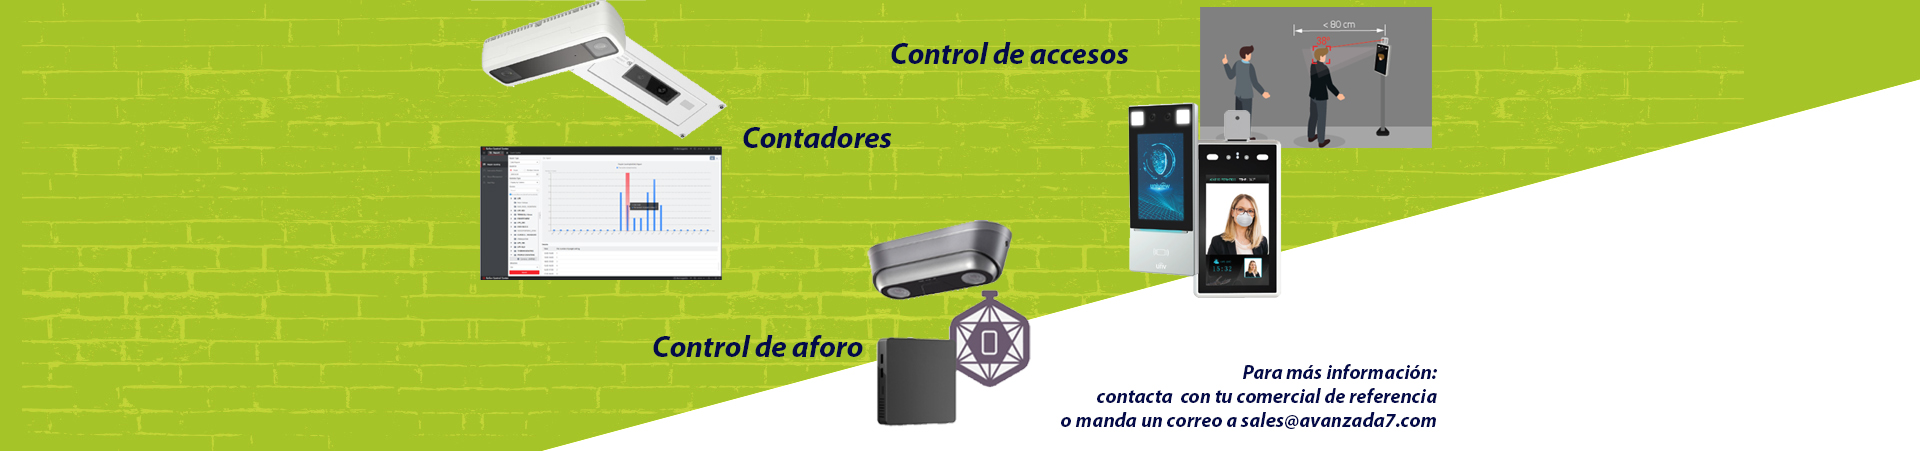 acceso personas contadores control